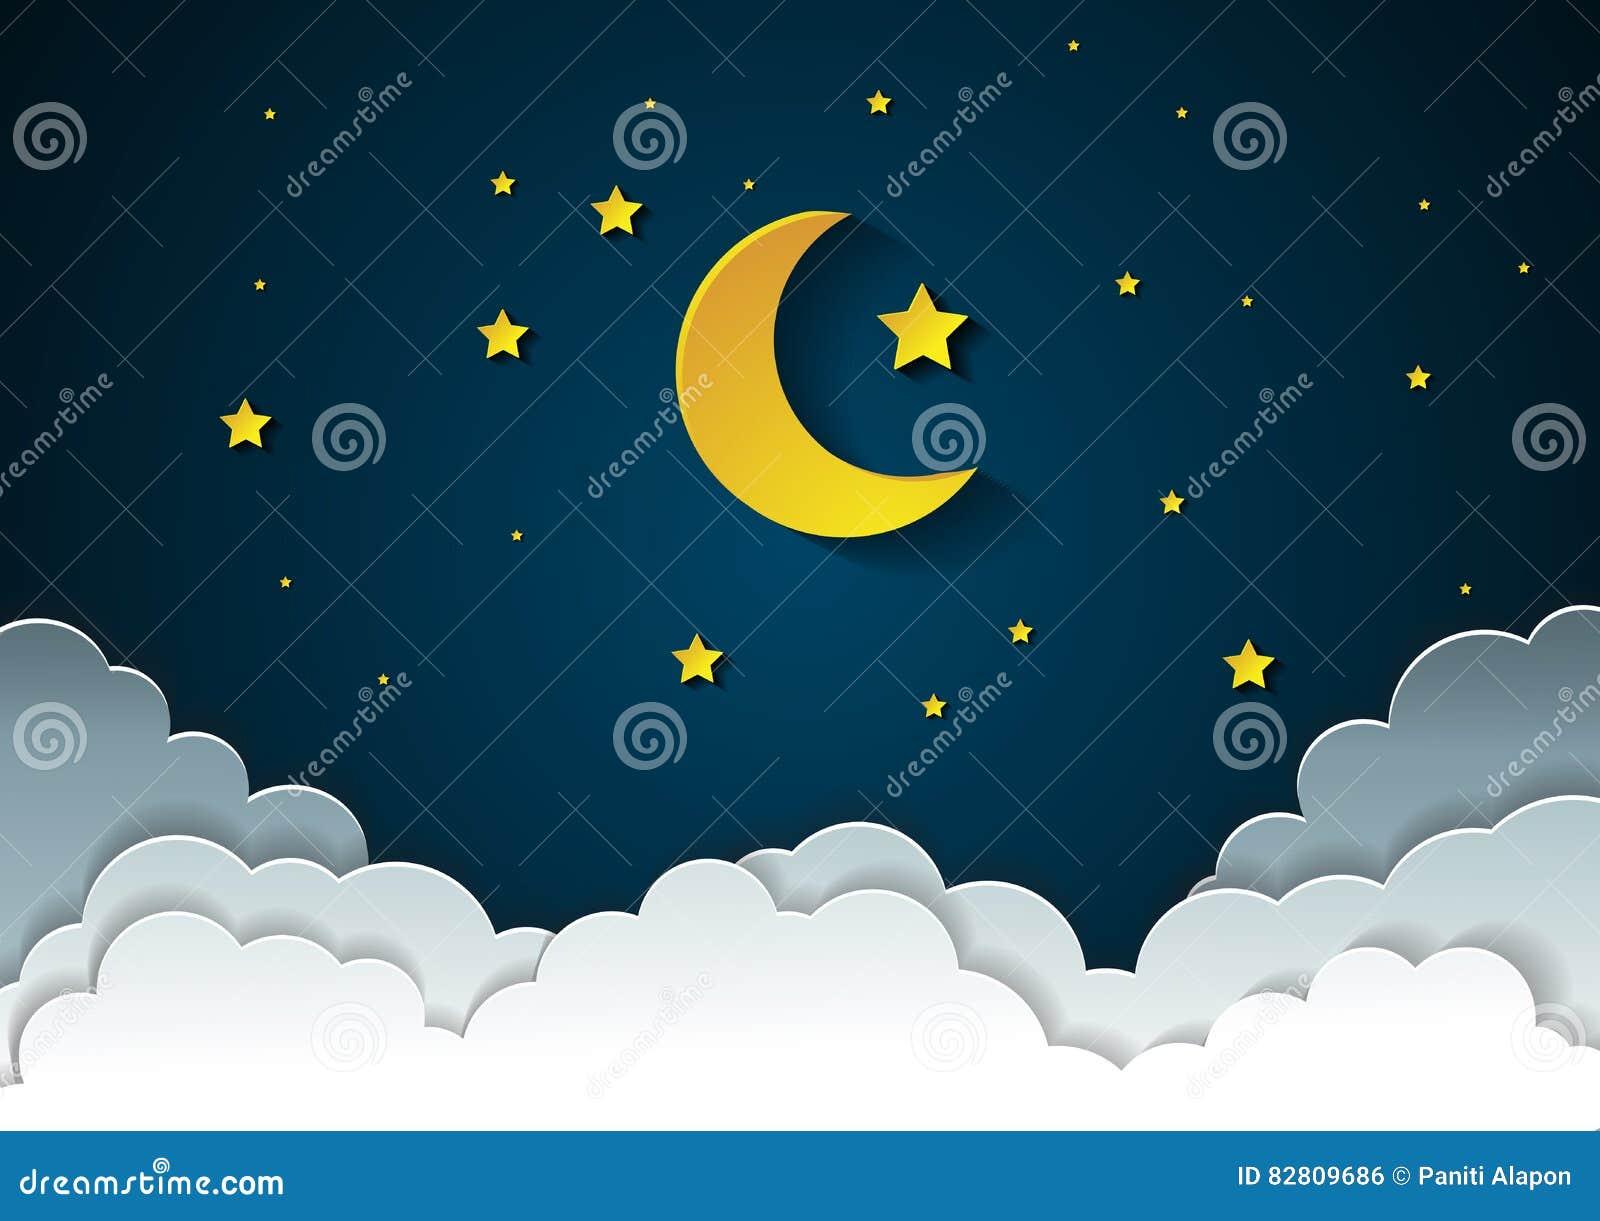 Foto Di Luna E Stelle.Luna E Stelle Nella Mezzanotte Stile Di Carta Di Arte